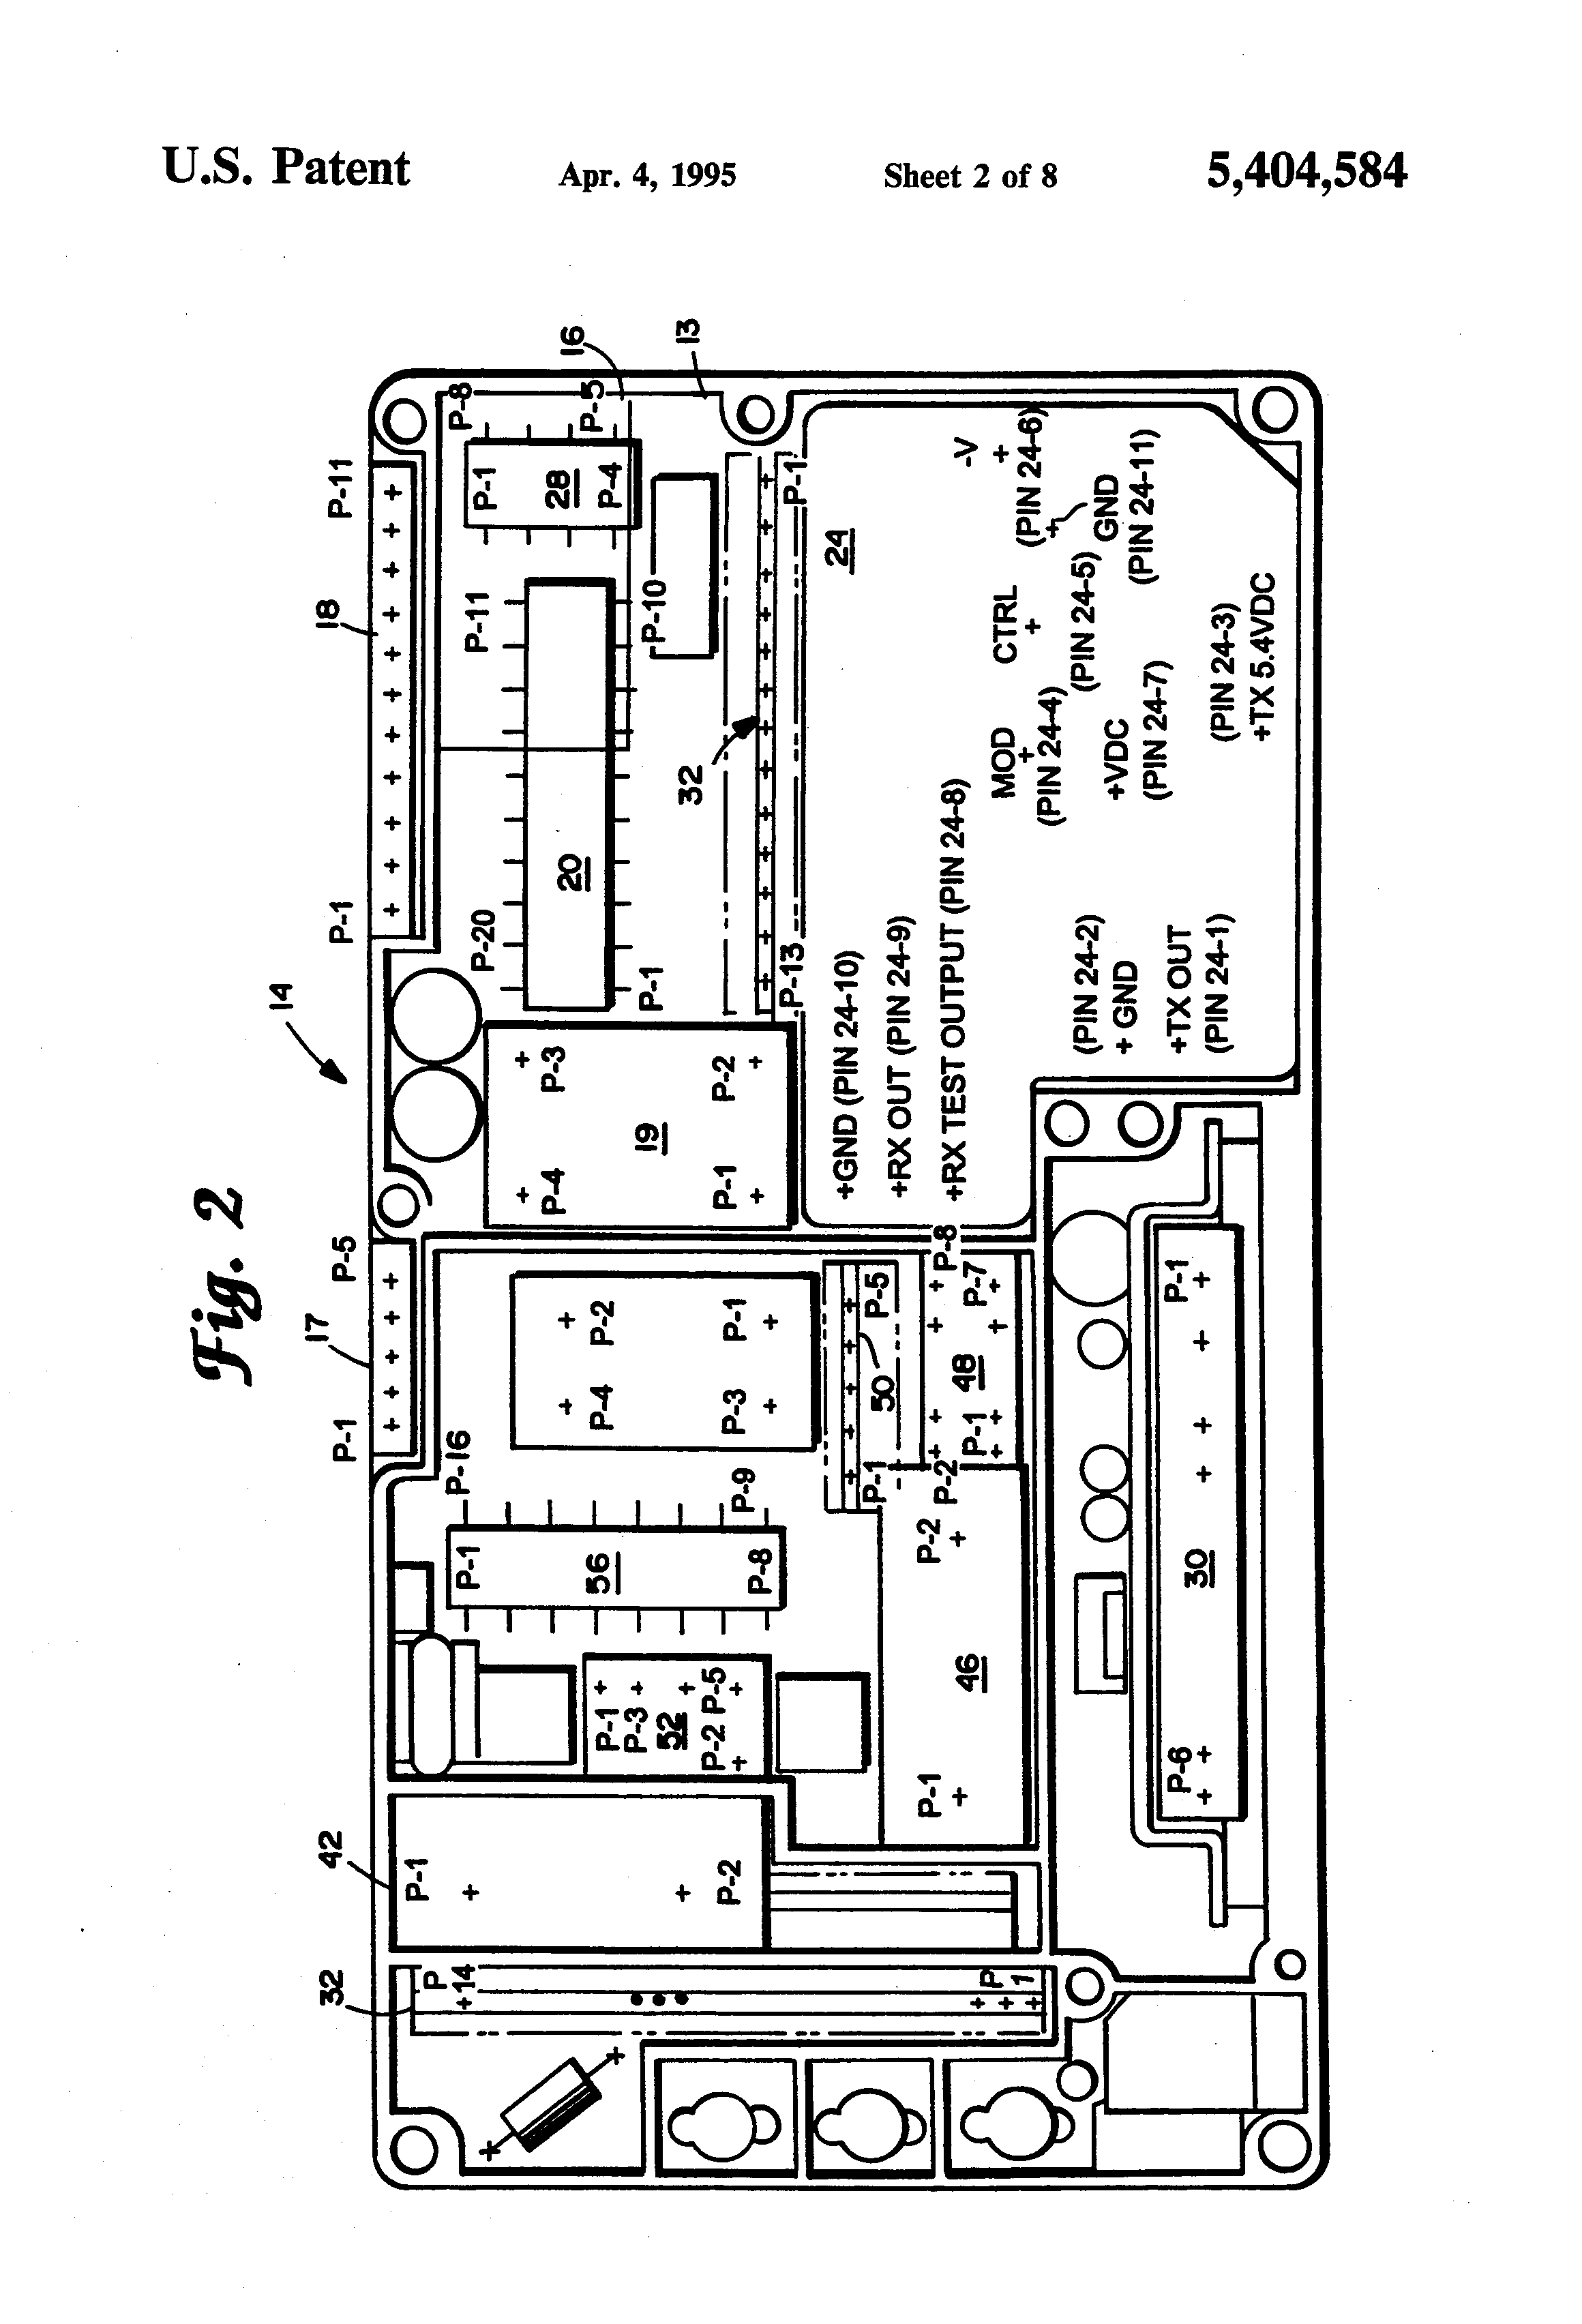 Patent Us5404584 Printed Circuit Board Having Modularized Wiring Function Drawing